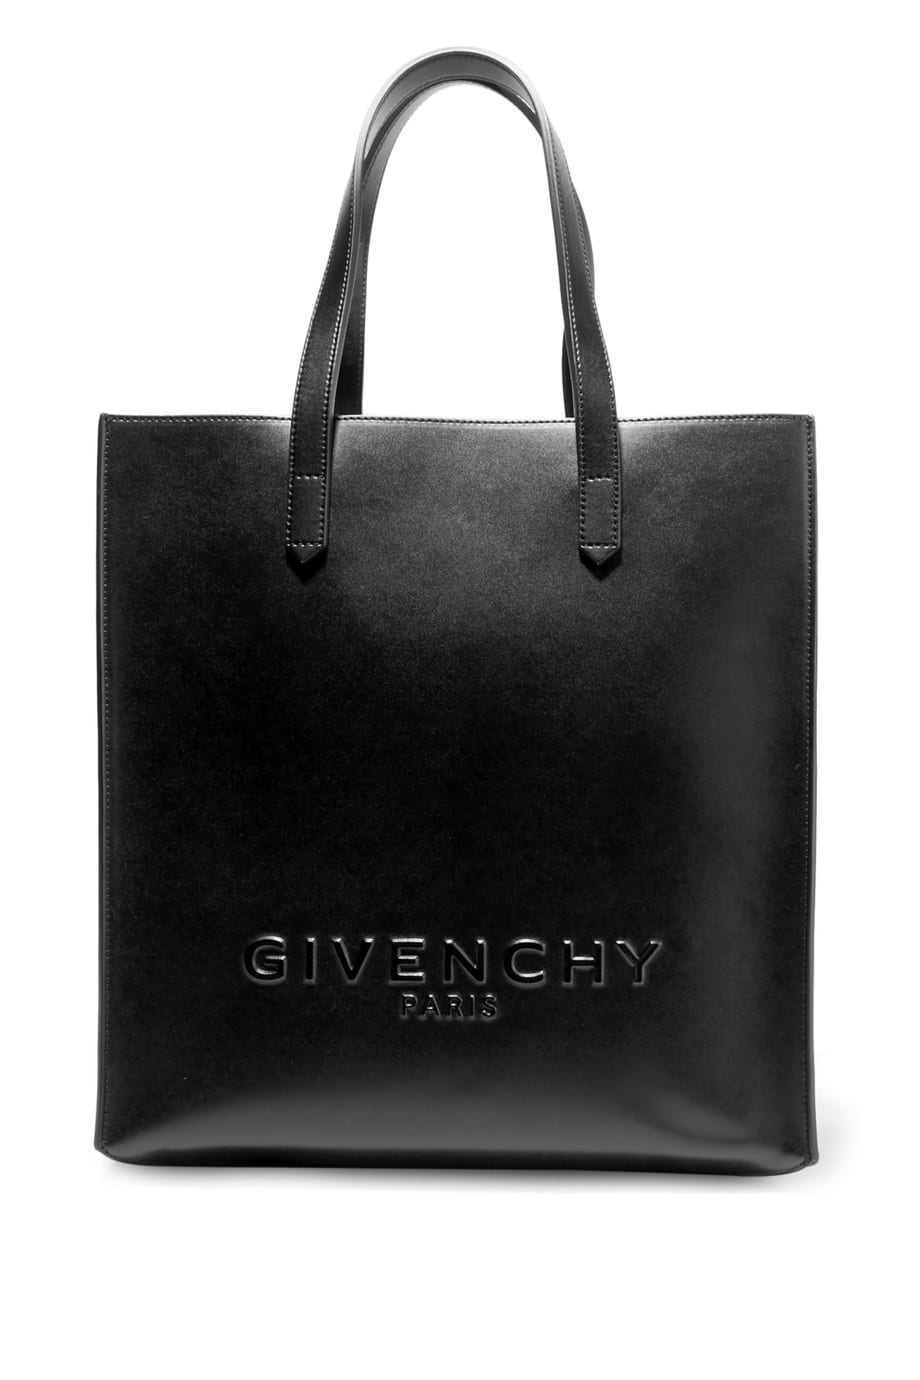 6978b94009 Givenchy Black Debossed Logo Tote Bag · Givenchy Black Debossed Logo Crossbody  Bag